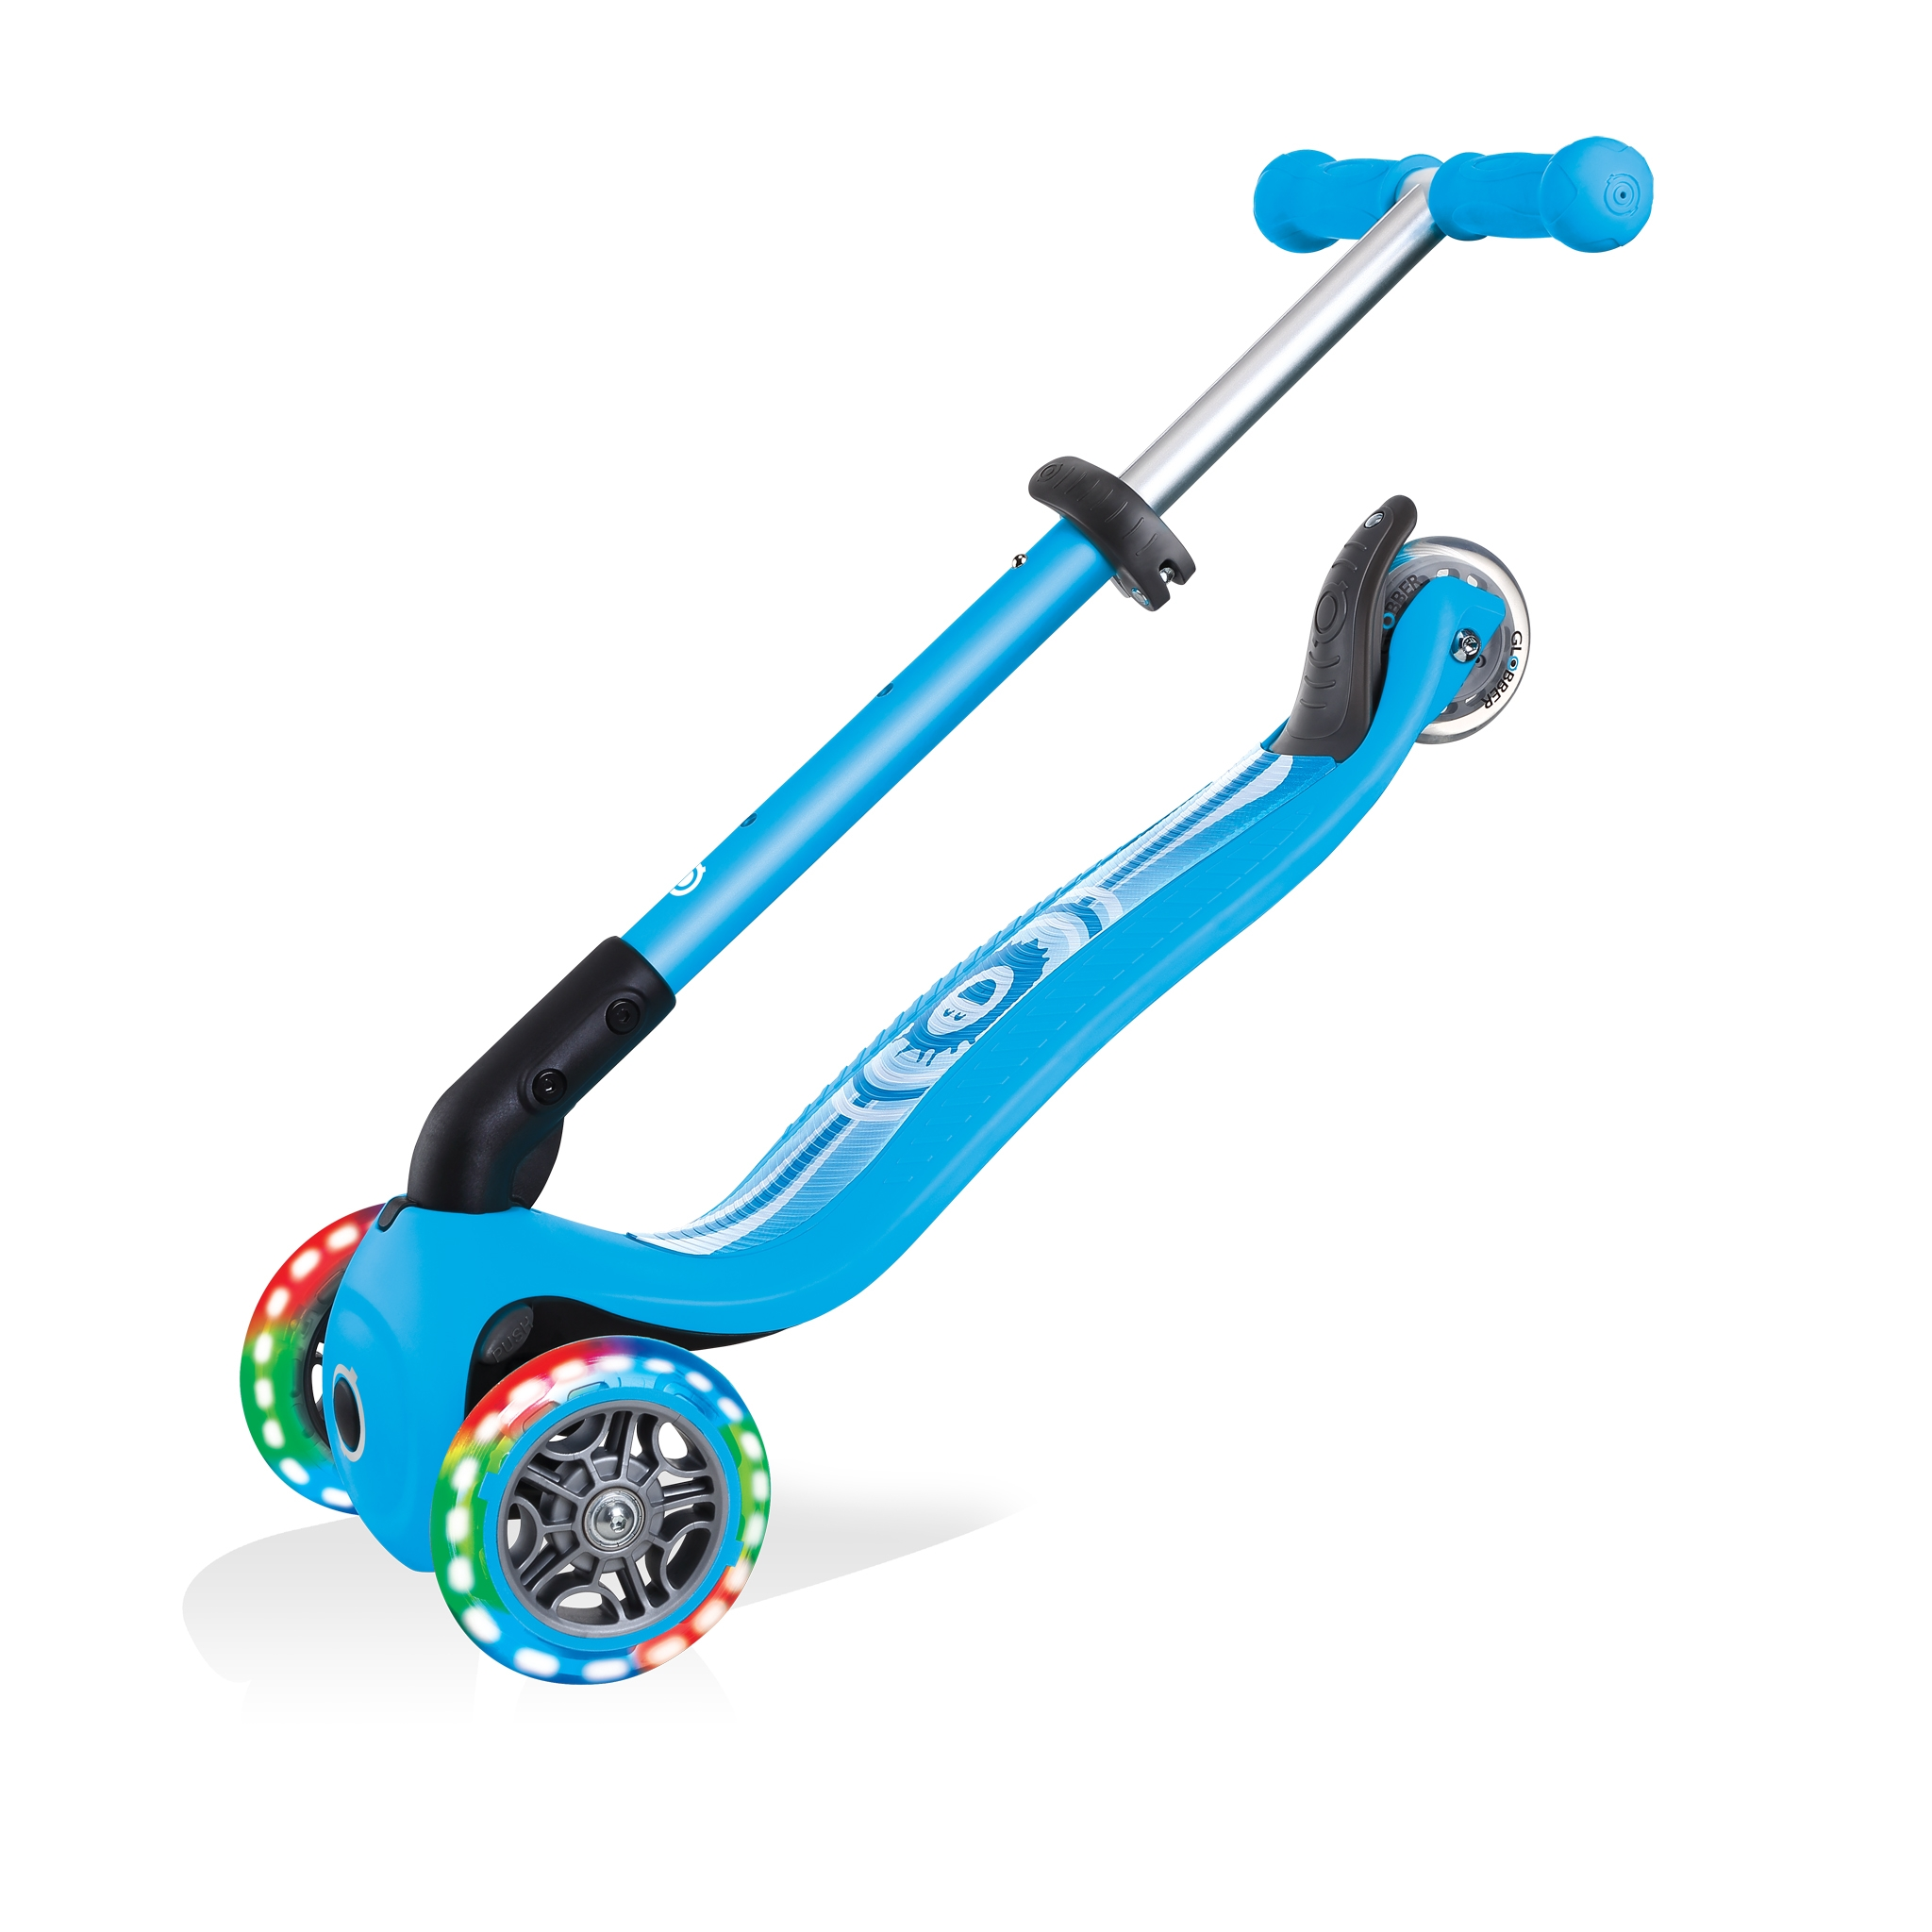 Foldable-3-wheel-toddler-scooter-Globber-JUNIOR-FOLDABLE-FANTASY-LIGHTS